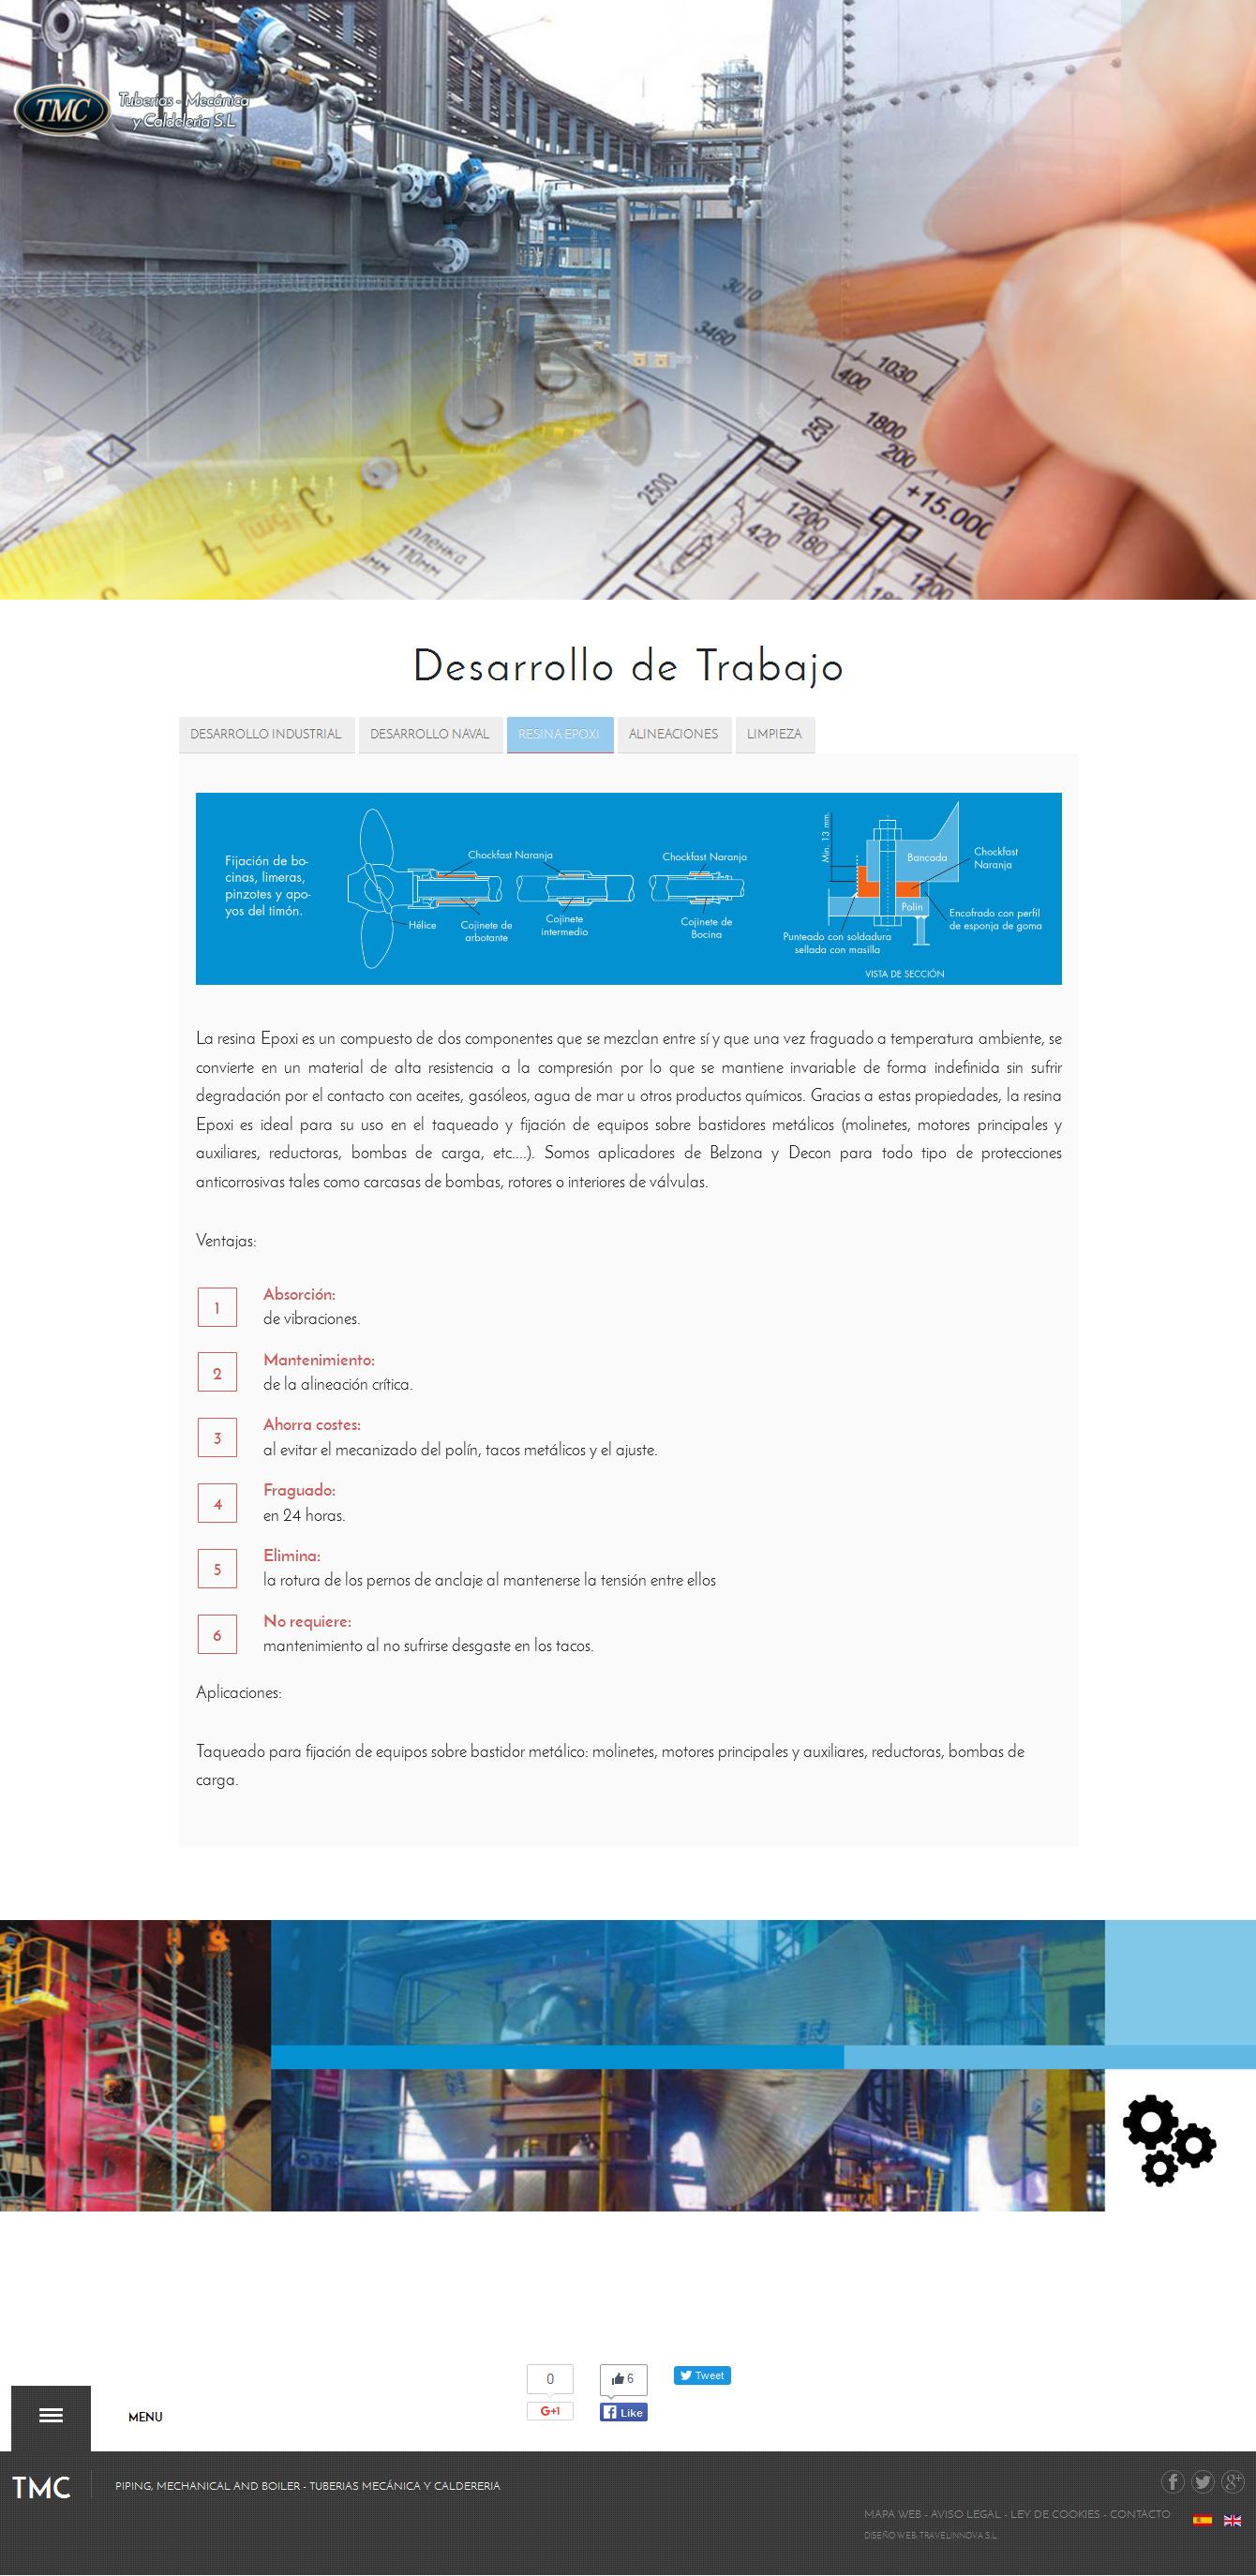 005-tmc-web-desarrollo-2